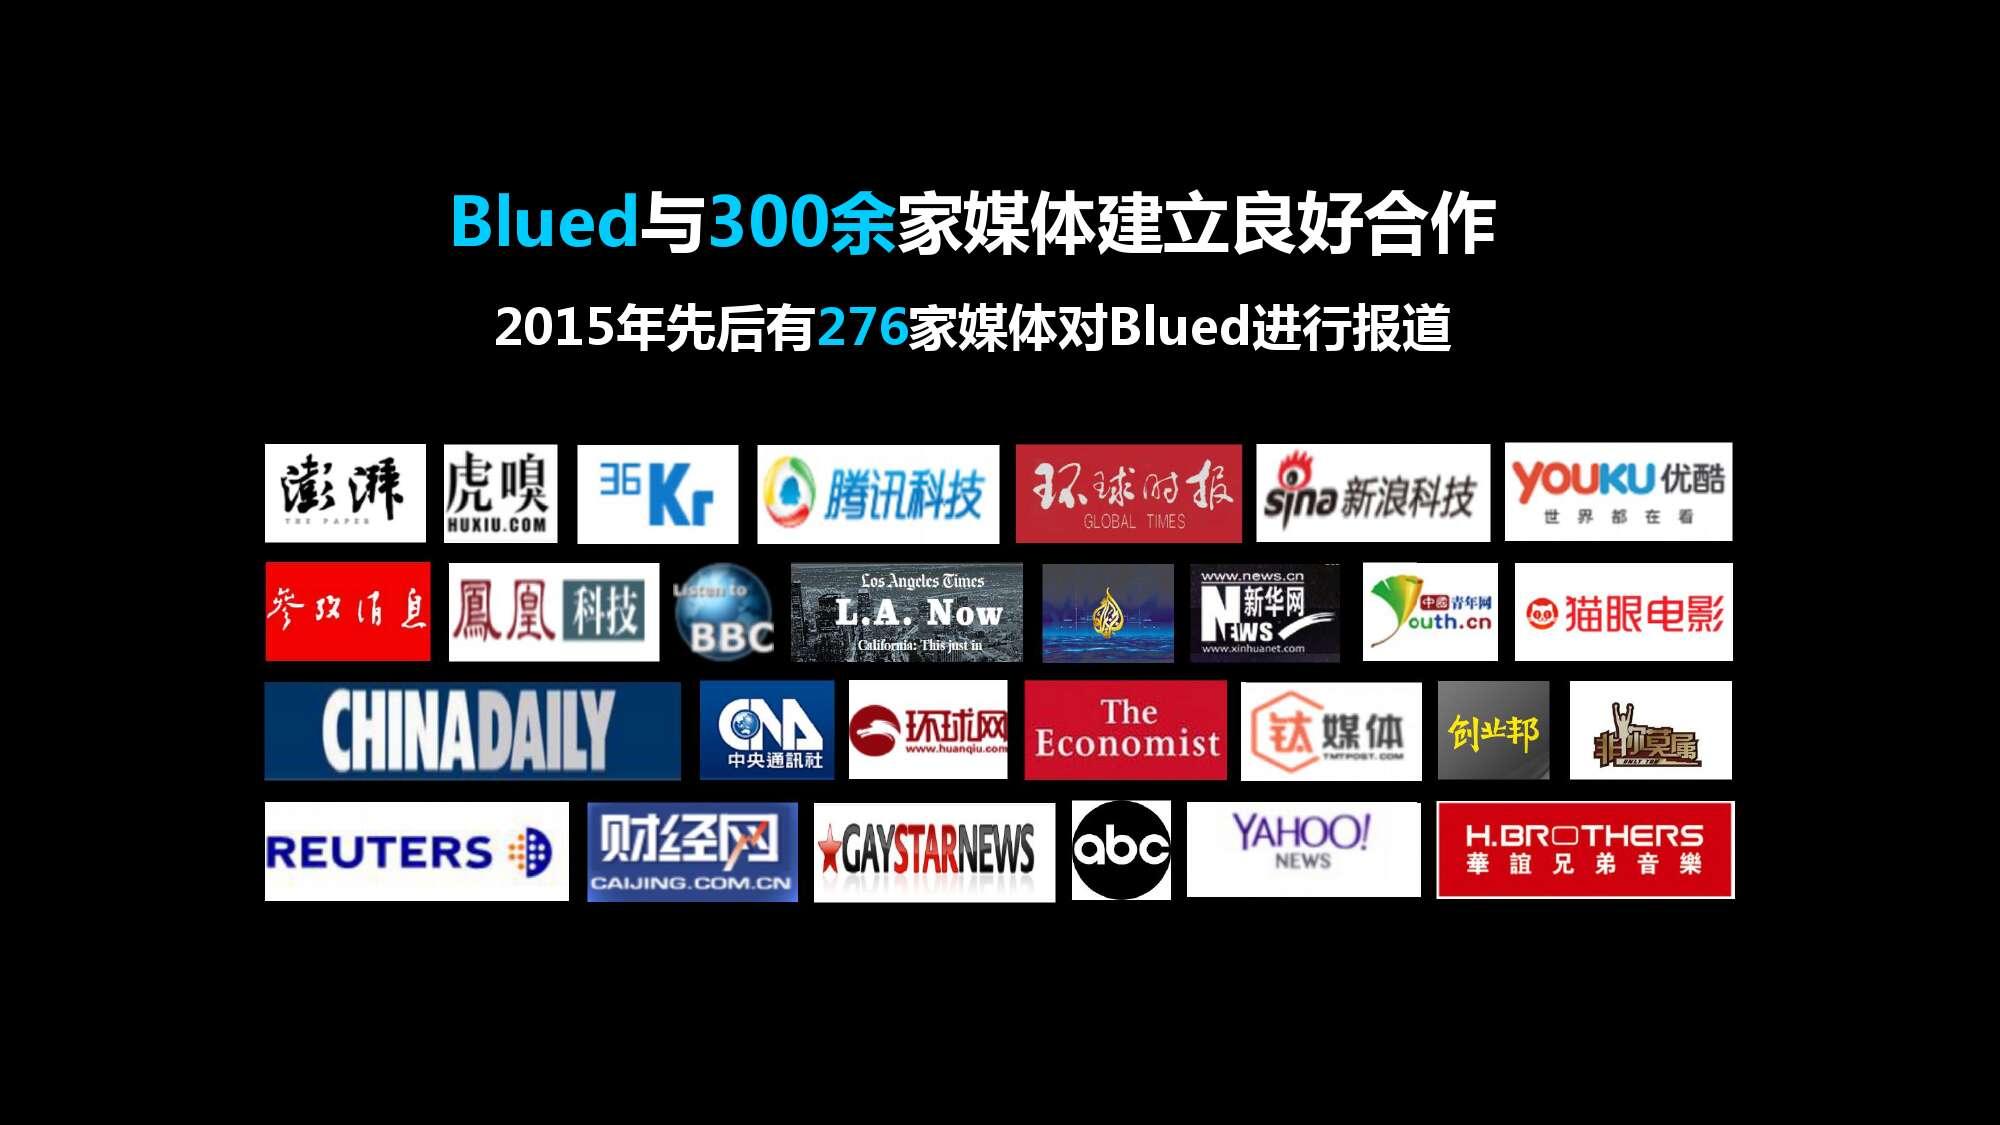 Blued2015中国同志社群大数据白皮书_000028